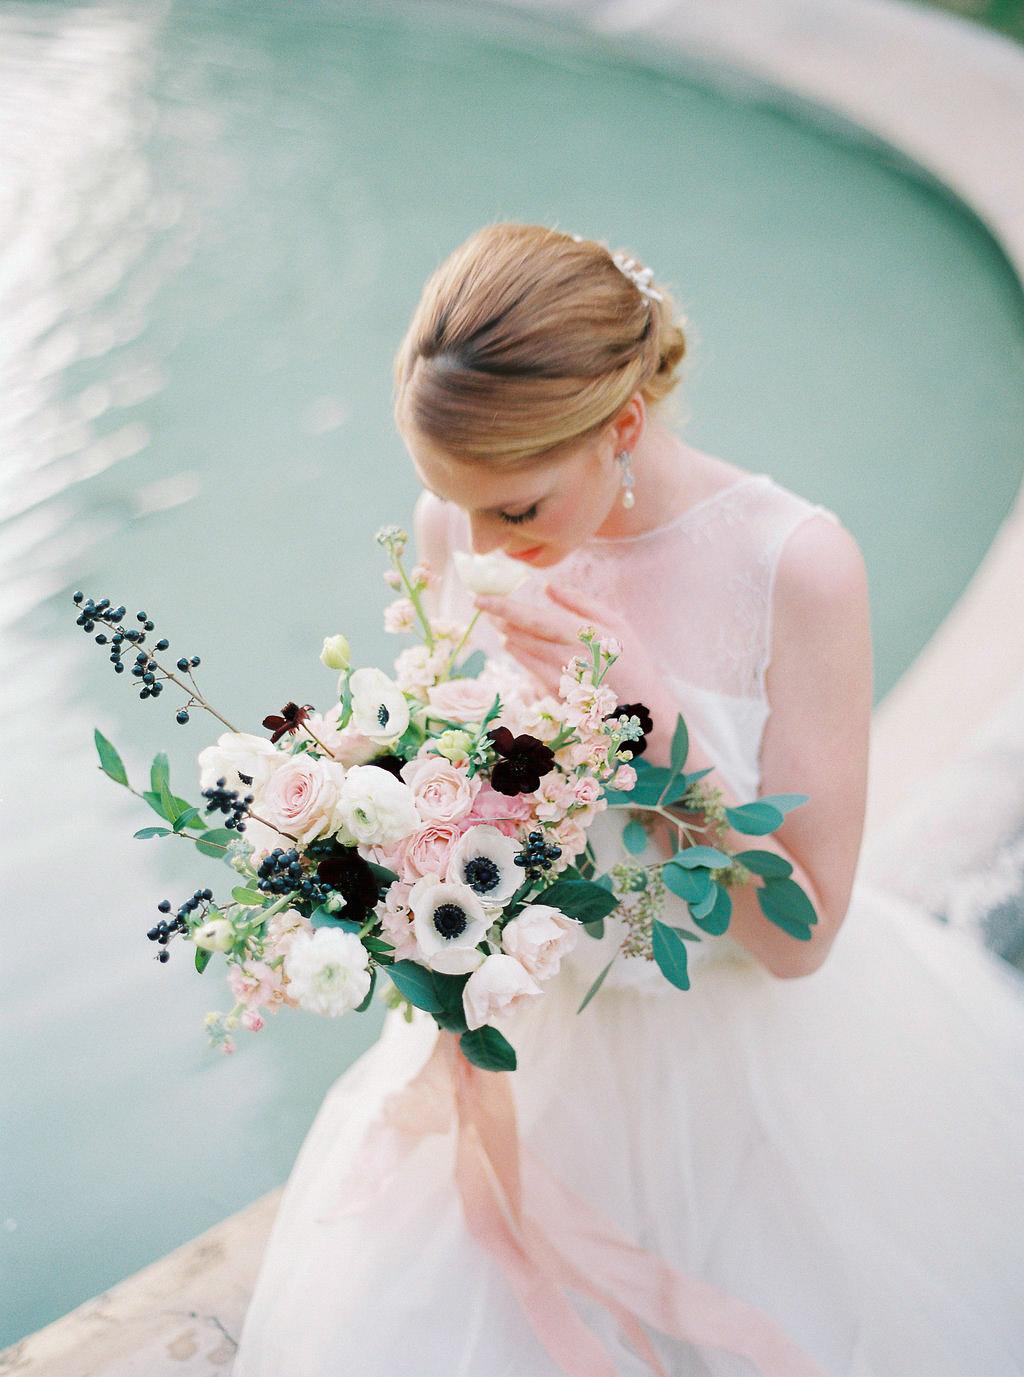 blush and white bride bouquet